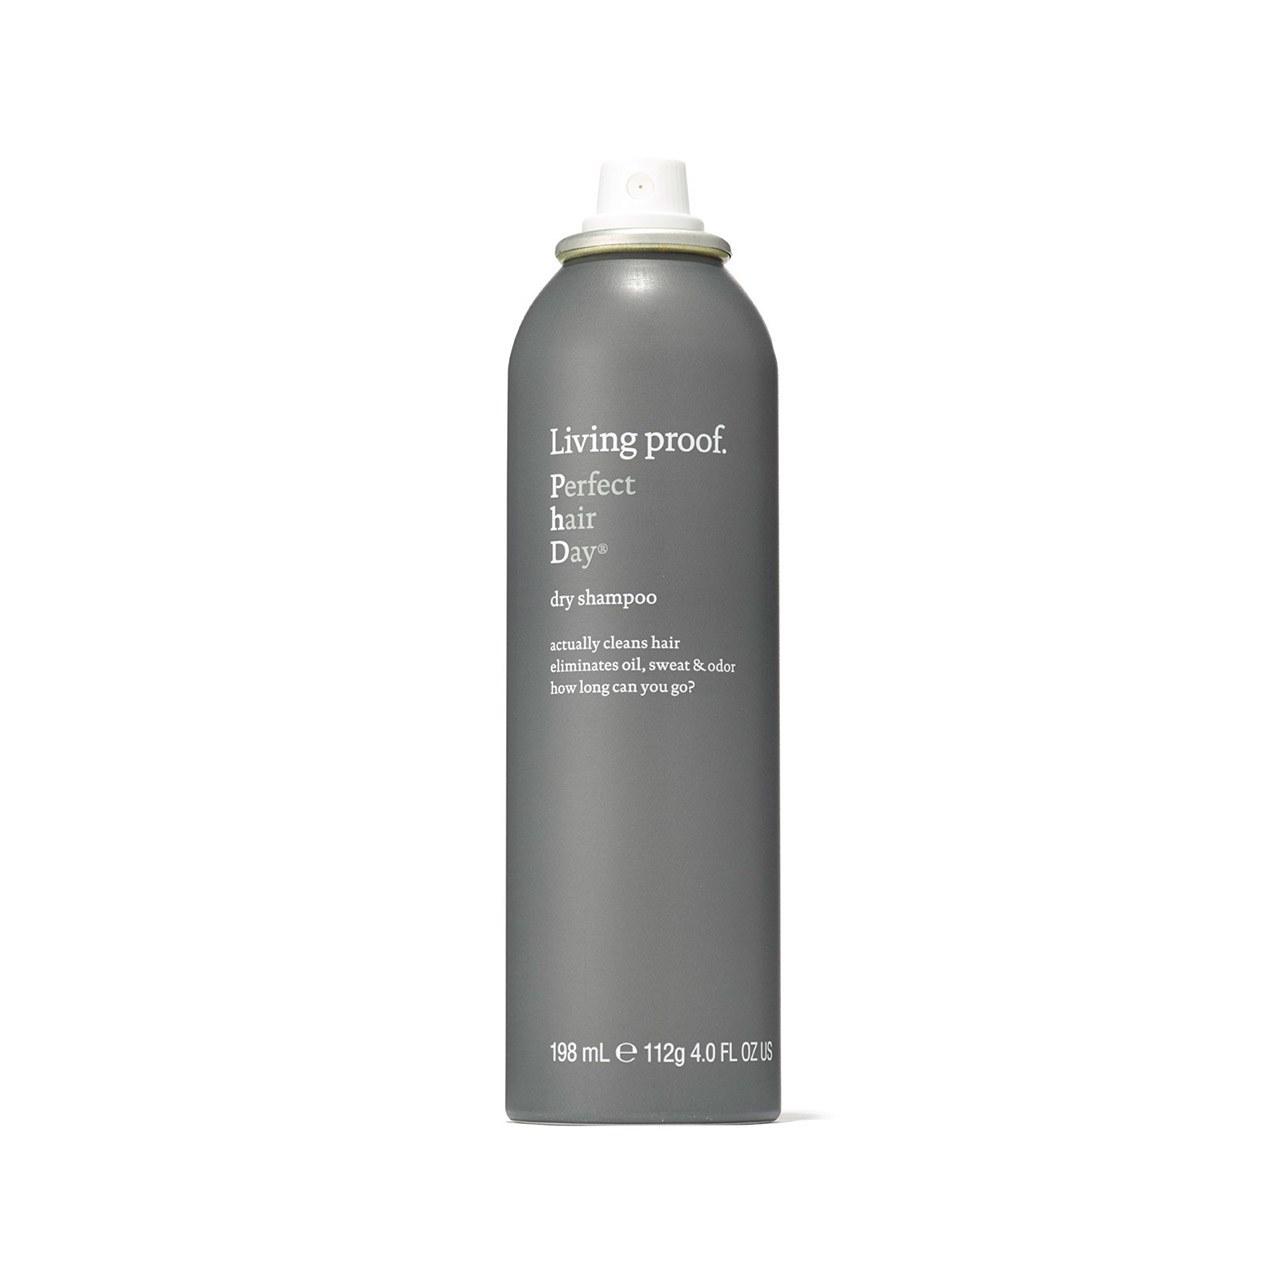 Living Proof Dry Shampoo $22